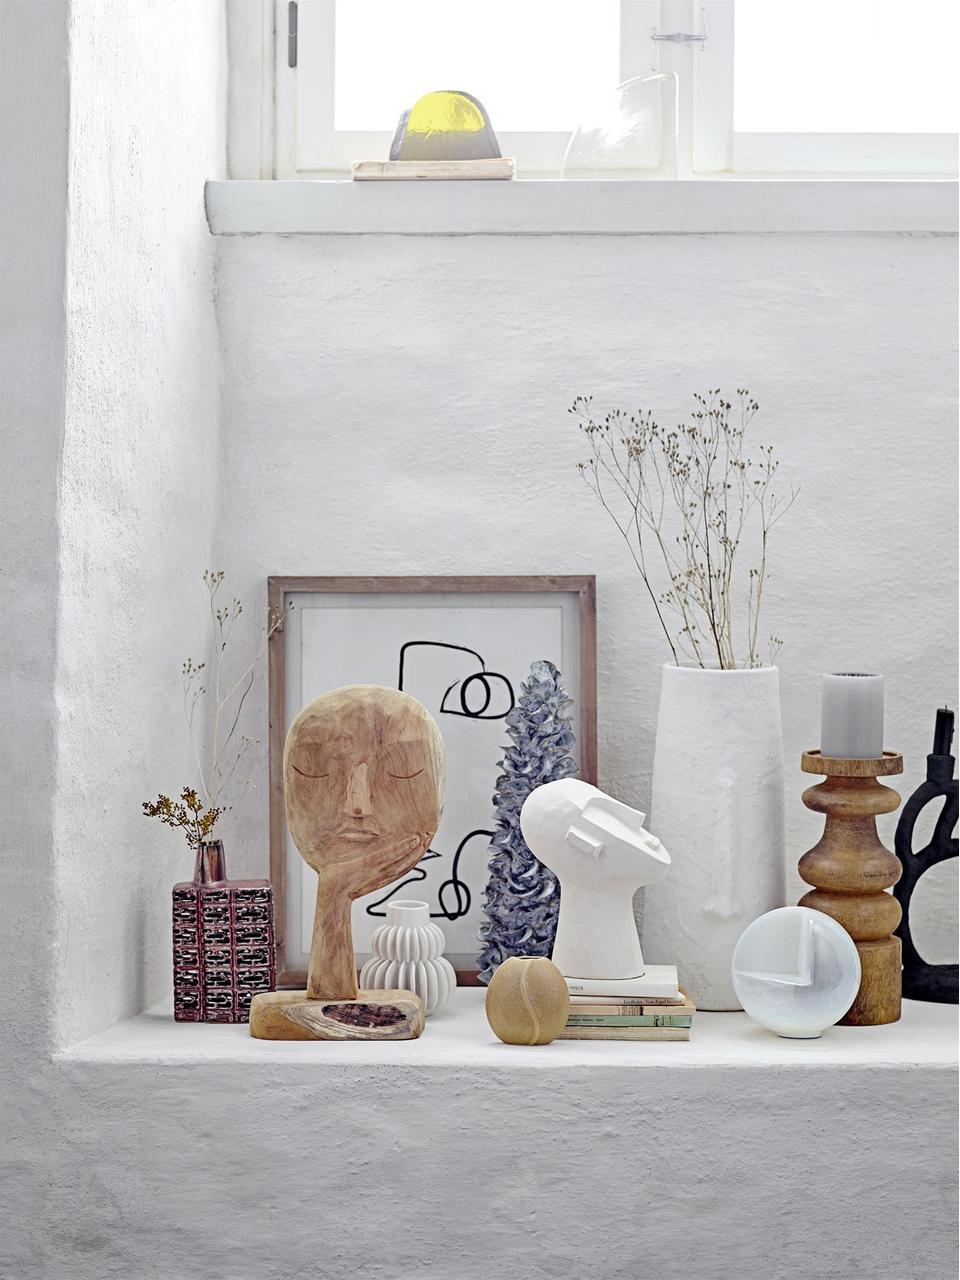 Deko-Objekt Man, Beton, bemalt, Weiß, 18 x 22 cm